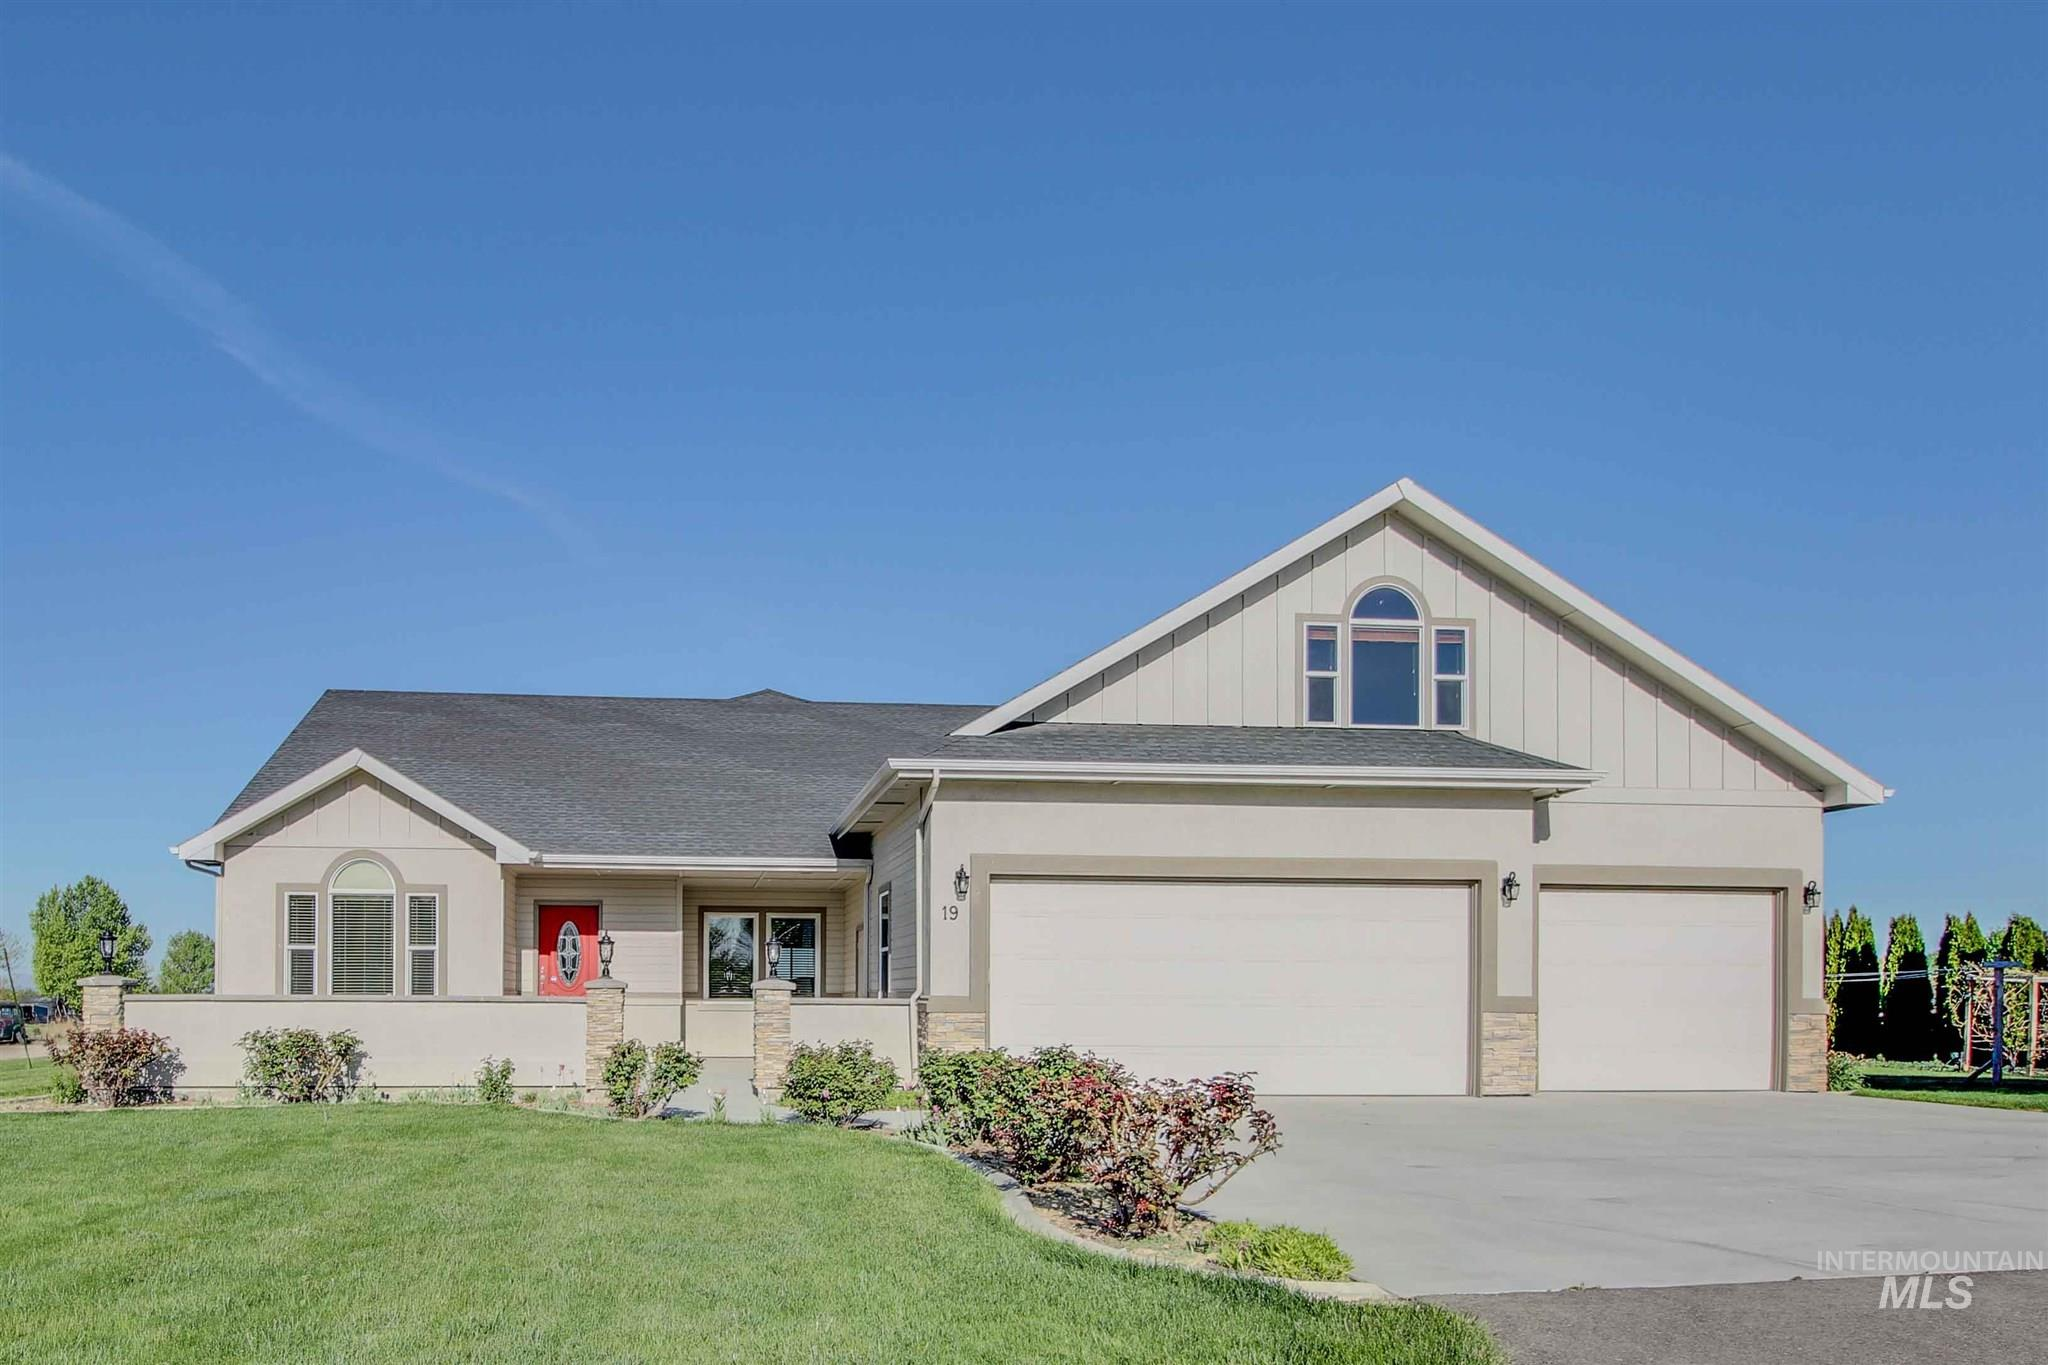 19 S Pit Lane Property Photo - Nampa, ID real estate listing